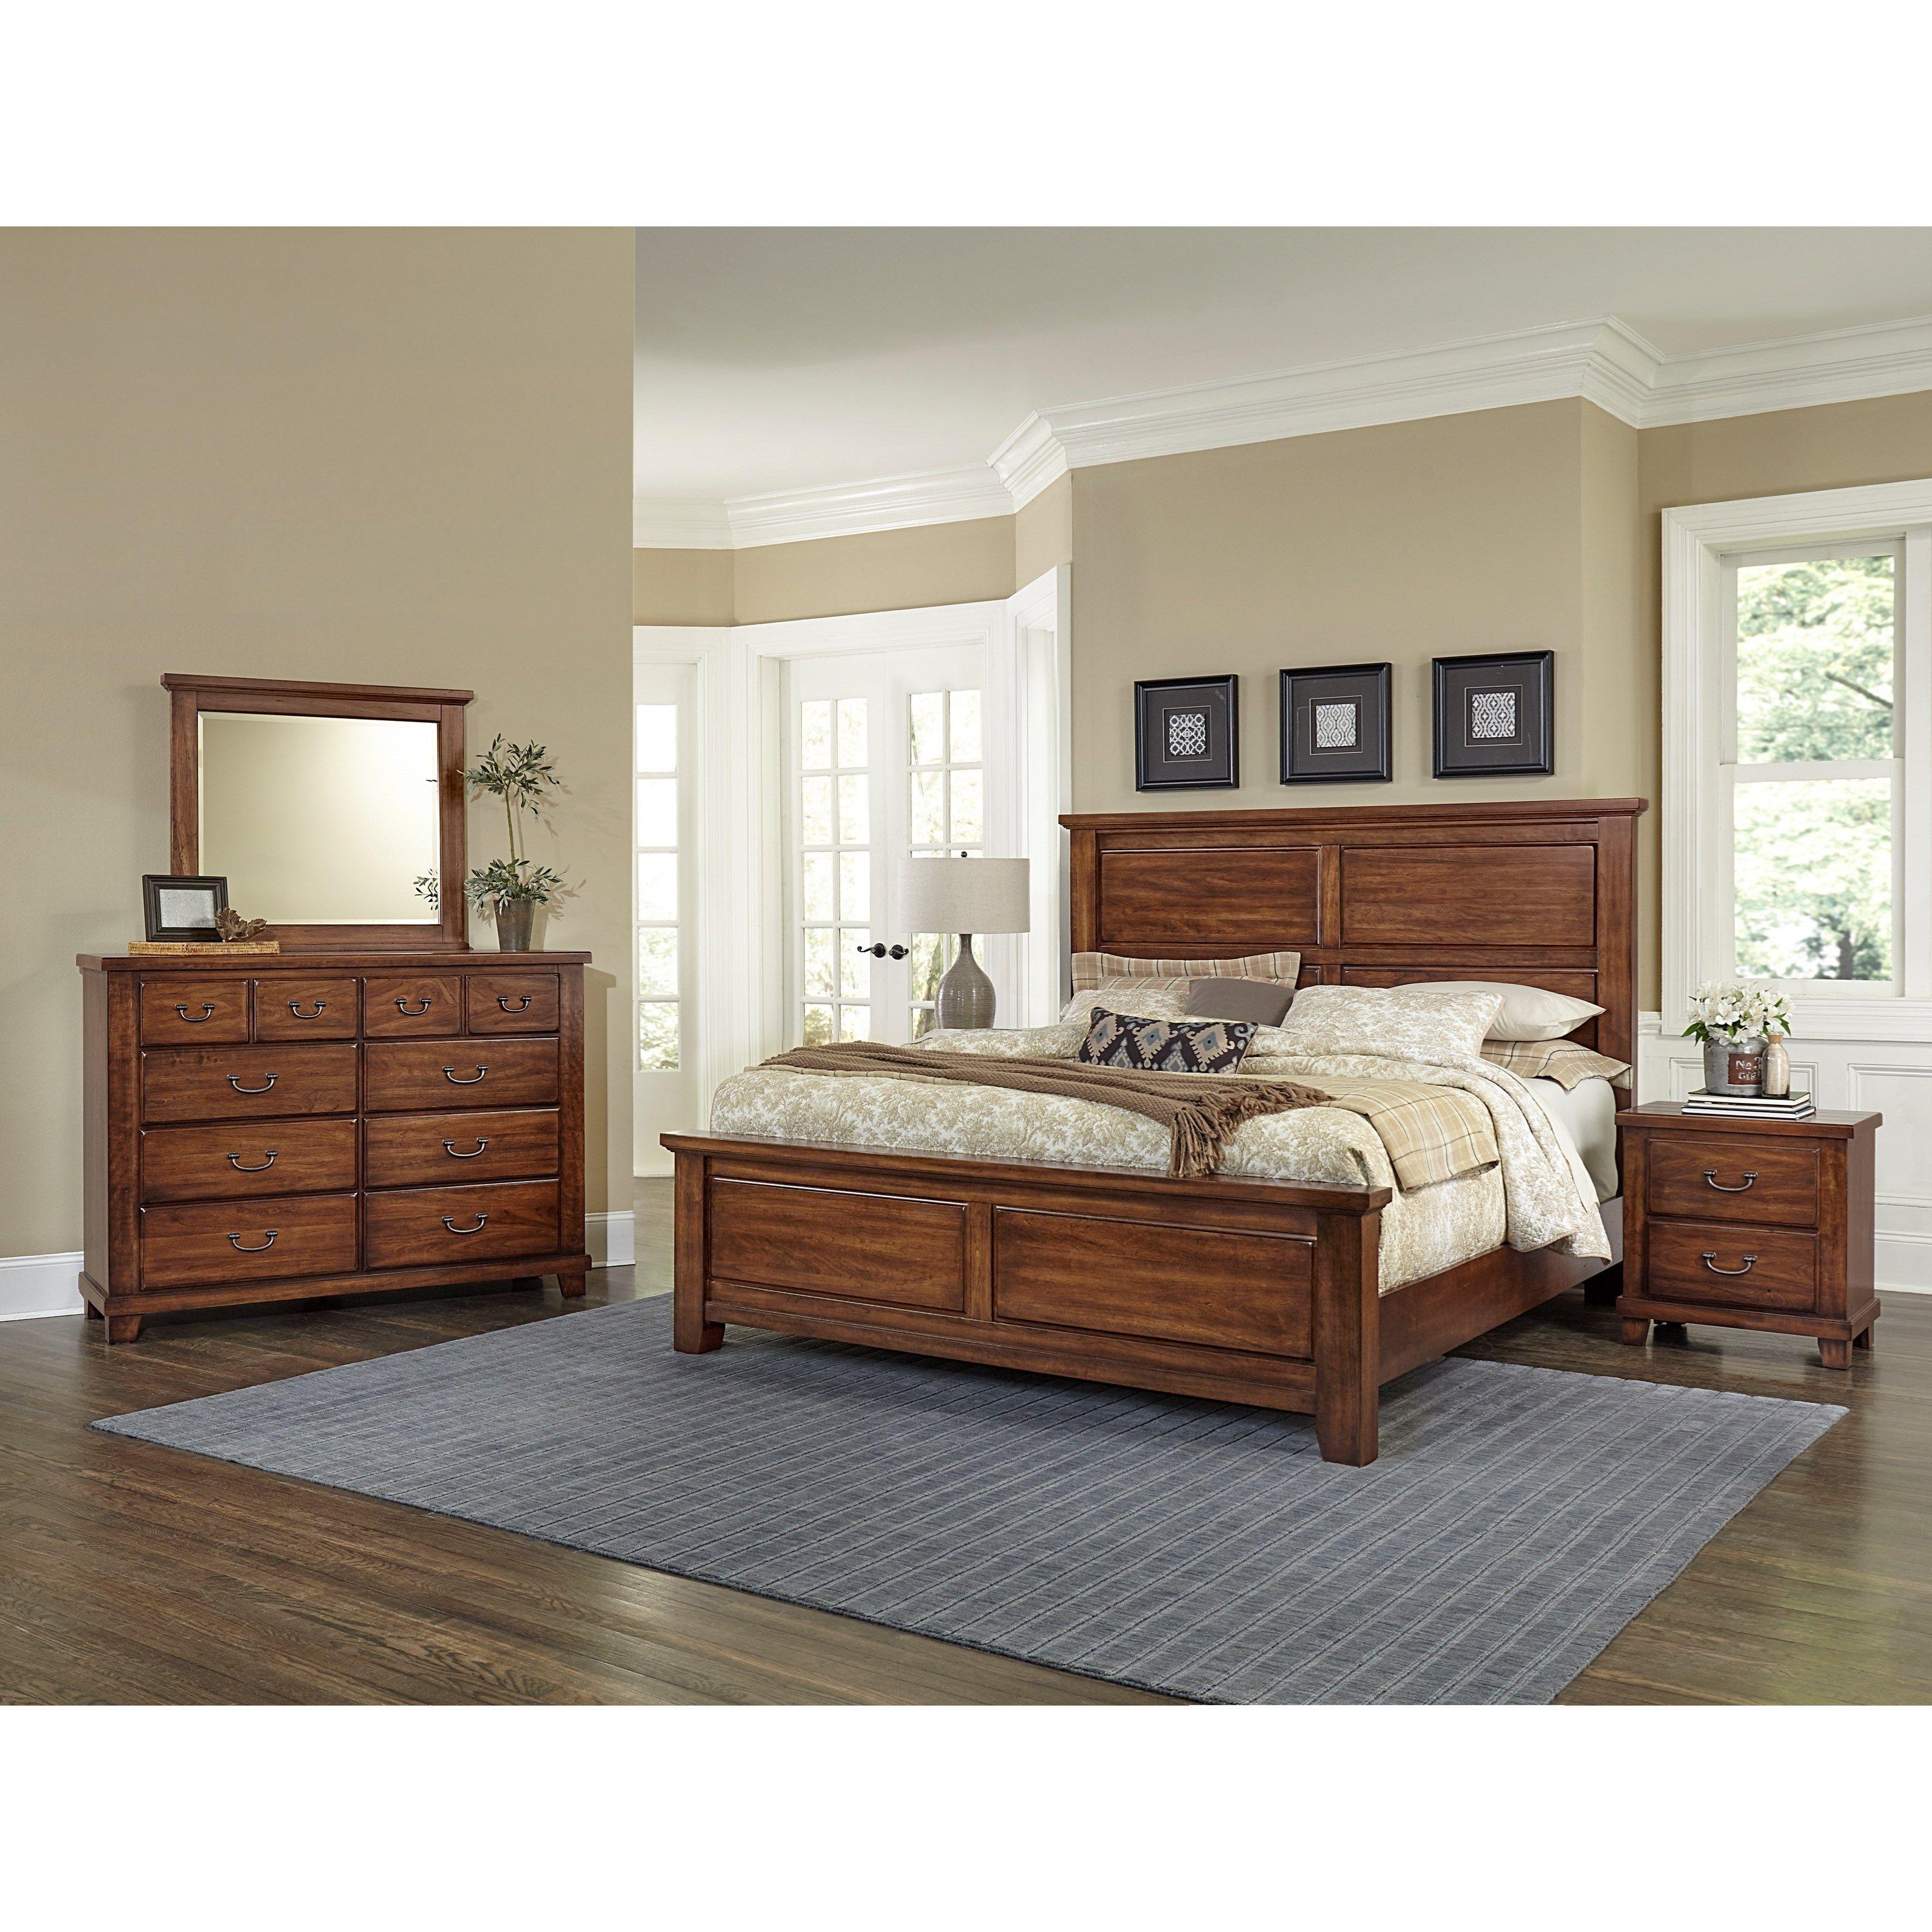 American Cherry King Bedroom Group by Vaughan Bassett